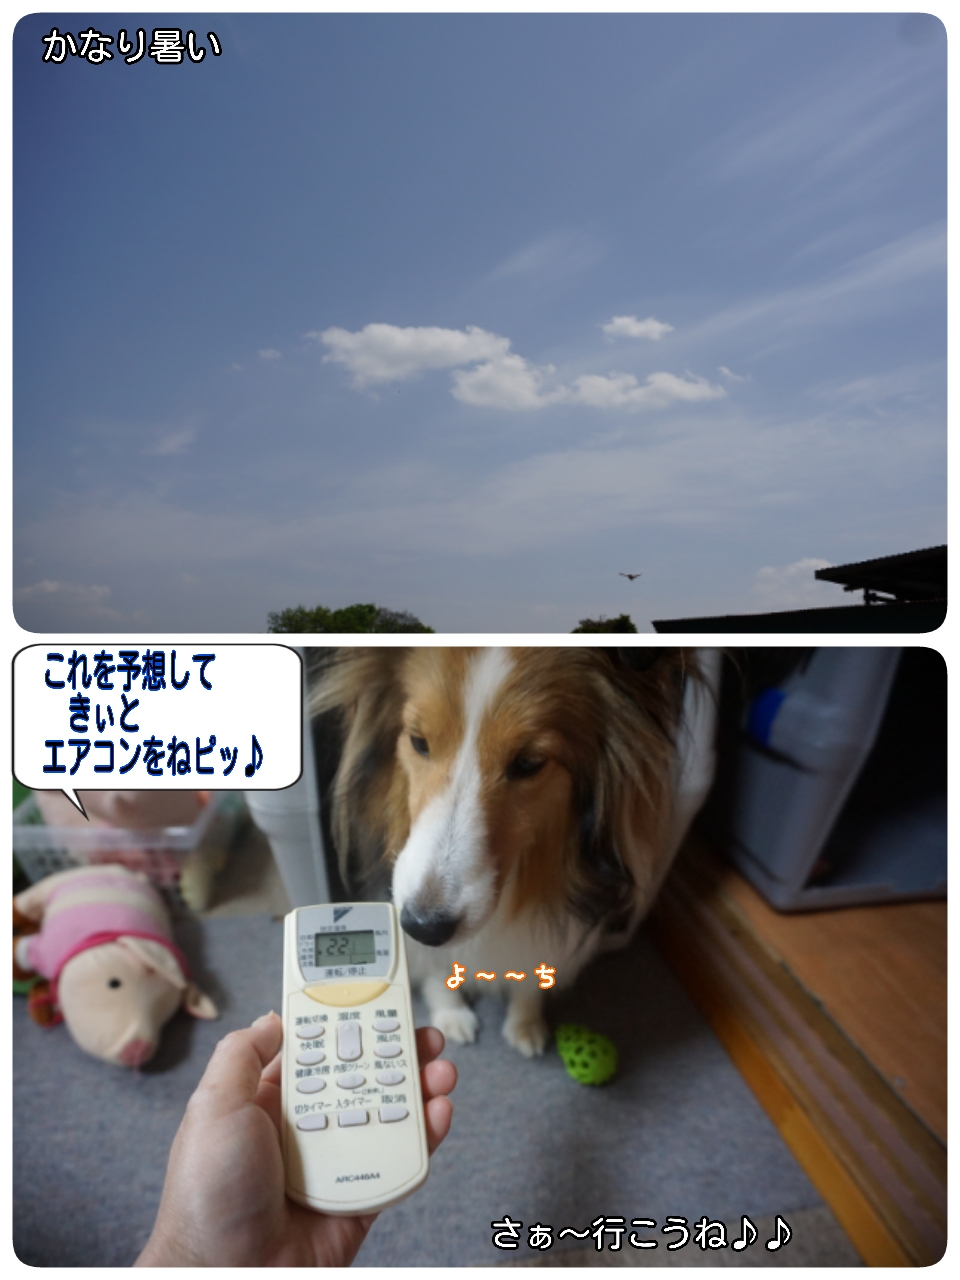 16-04-25-13-55-16-214_deco.jpg